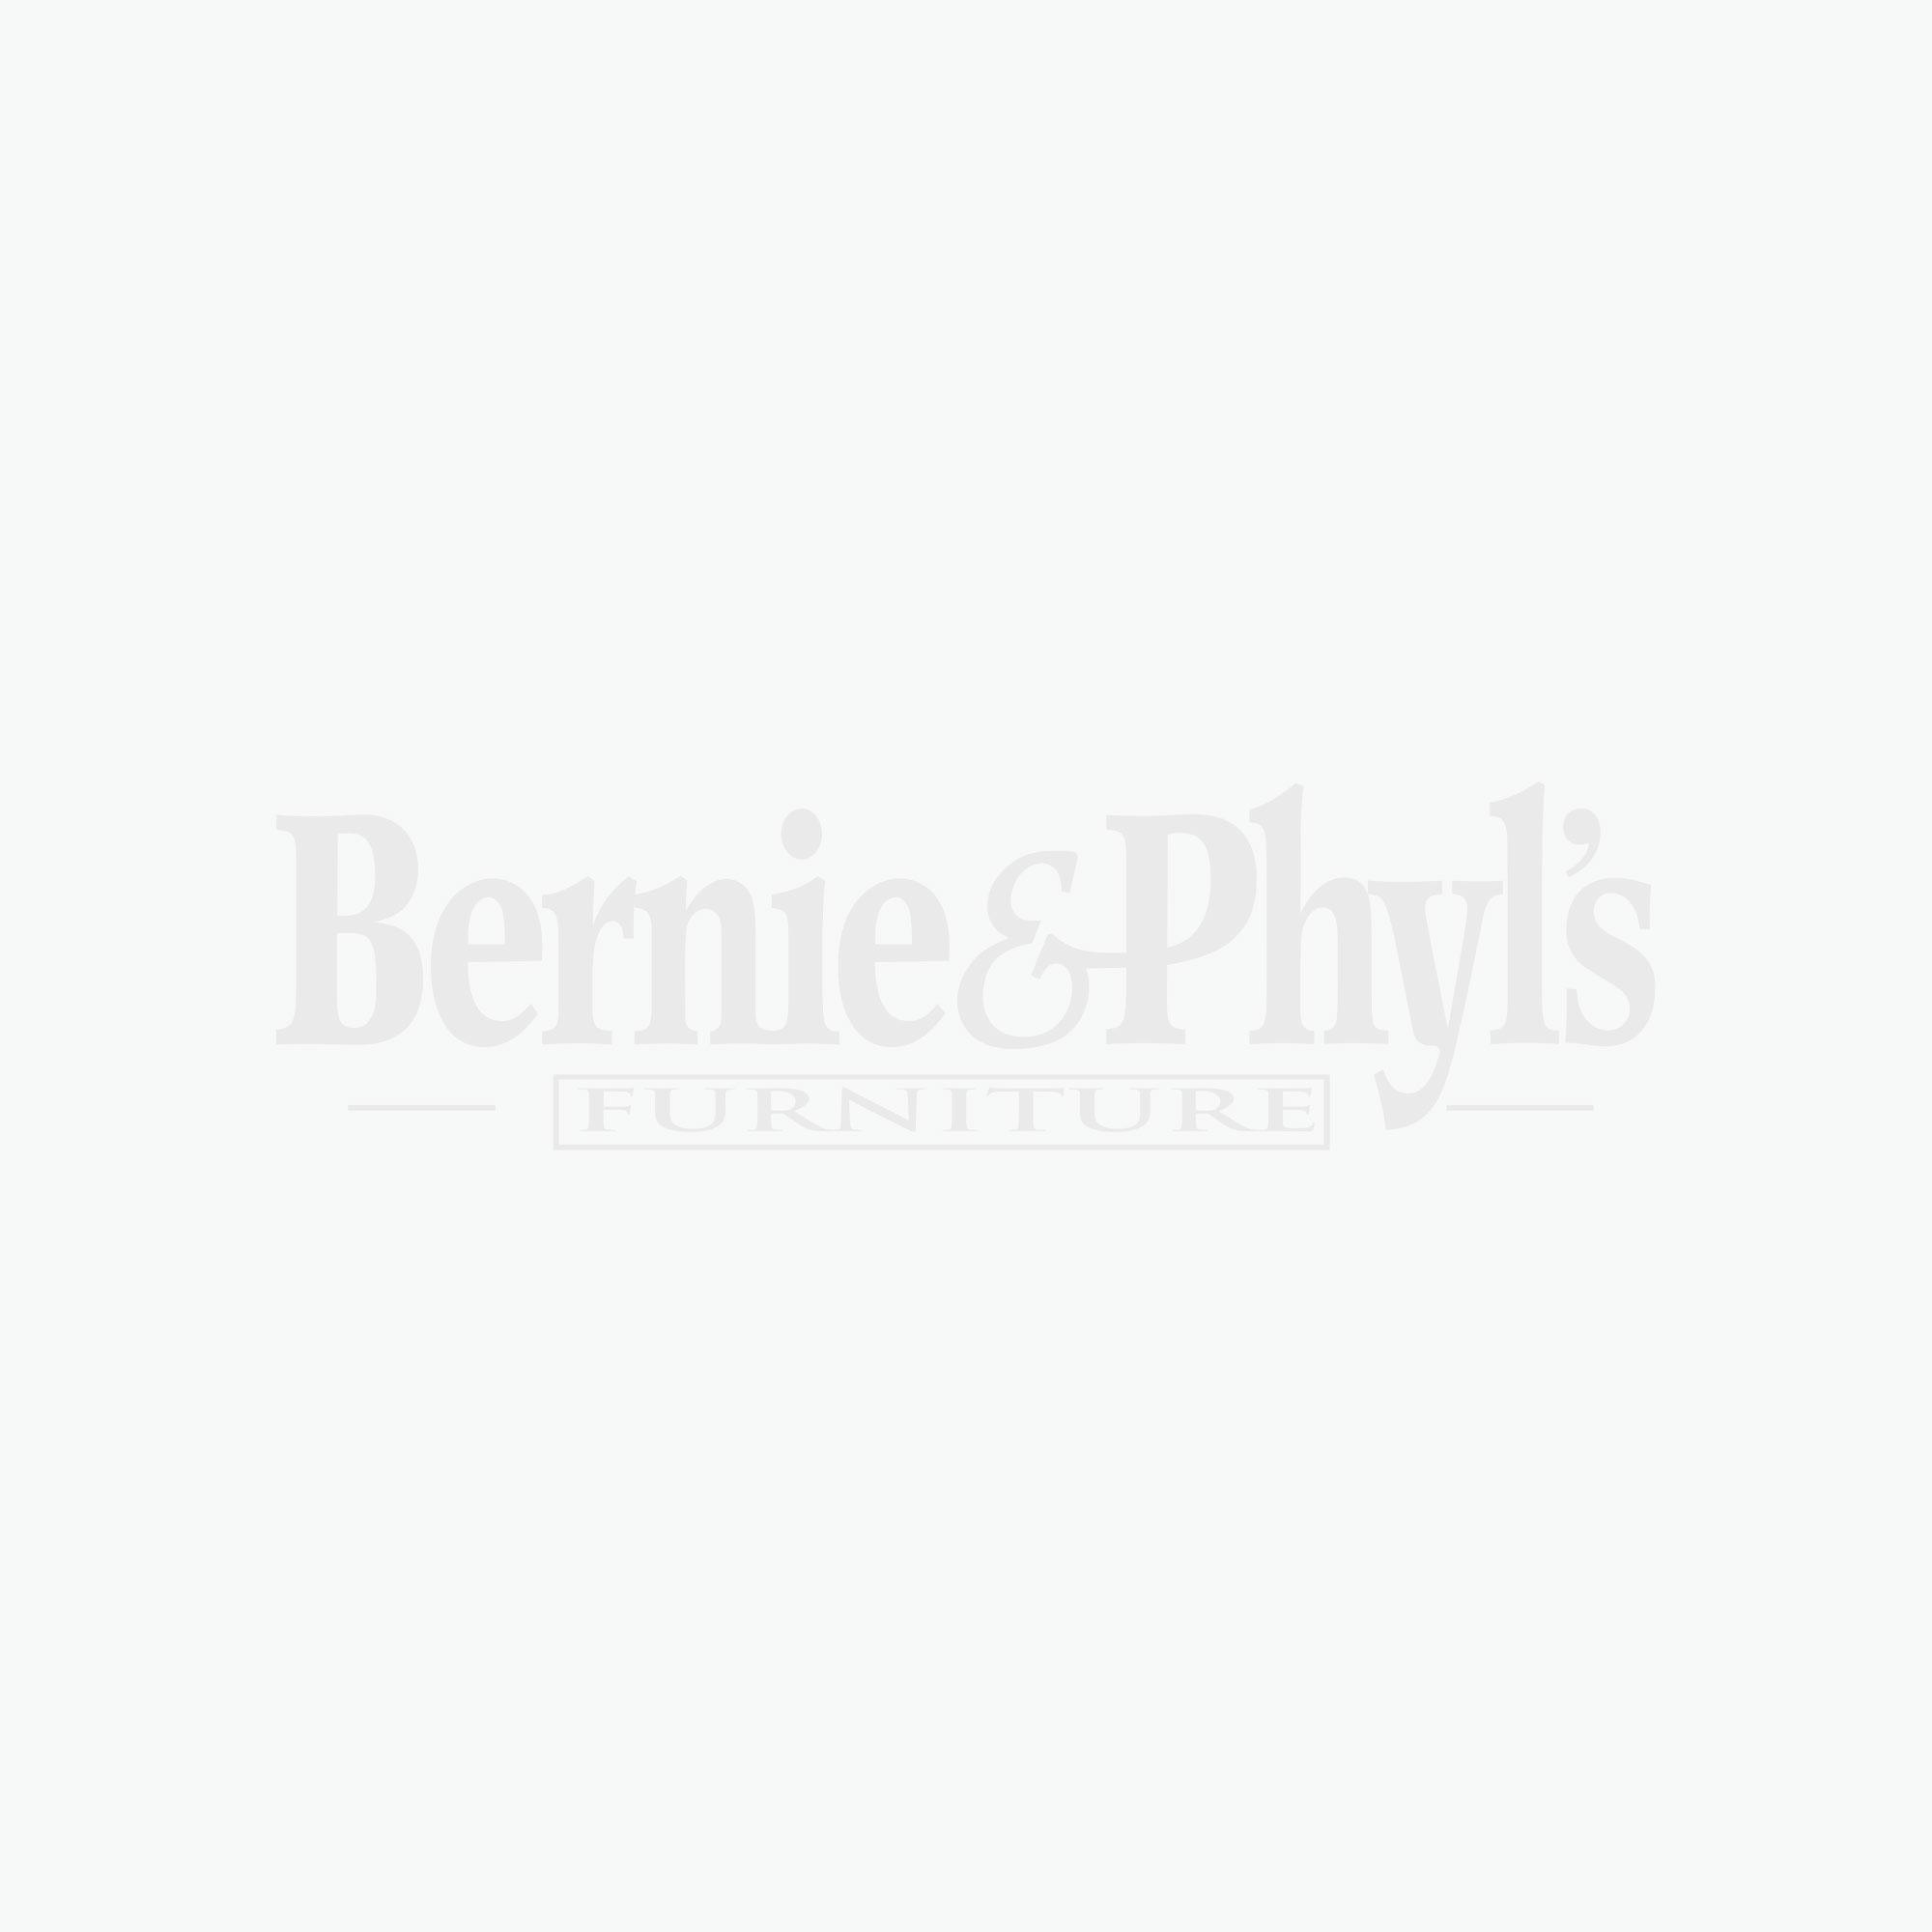 Kavara Barstool - Medium Brown - (Set of 2) - D469-124 by Ashley Furniture Signature Design